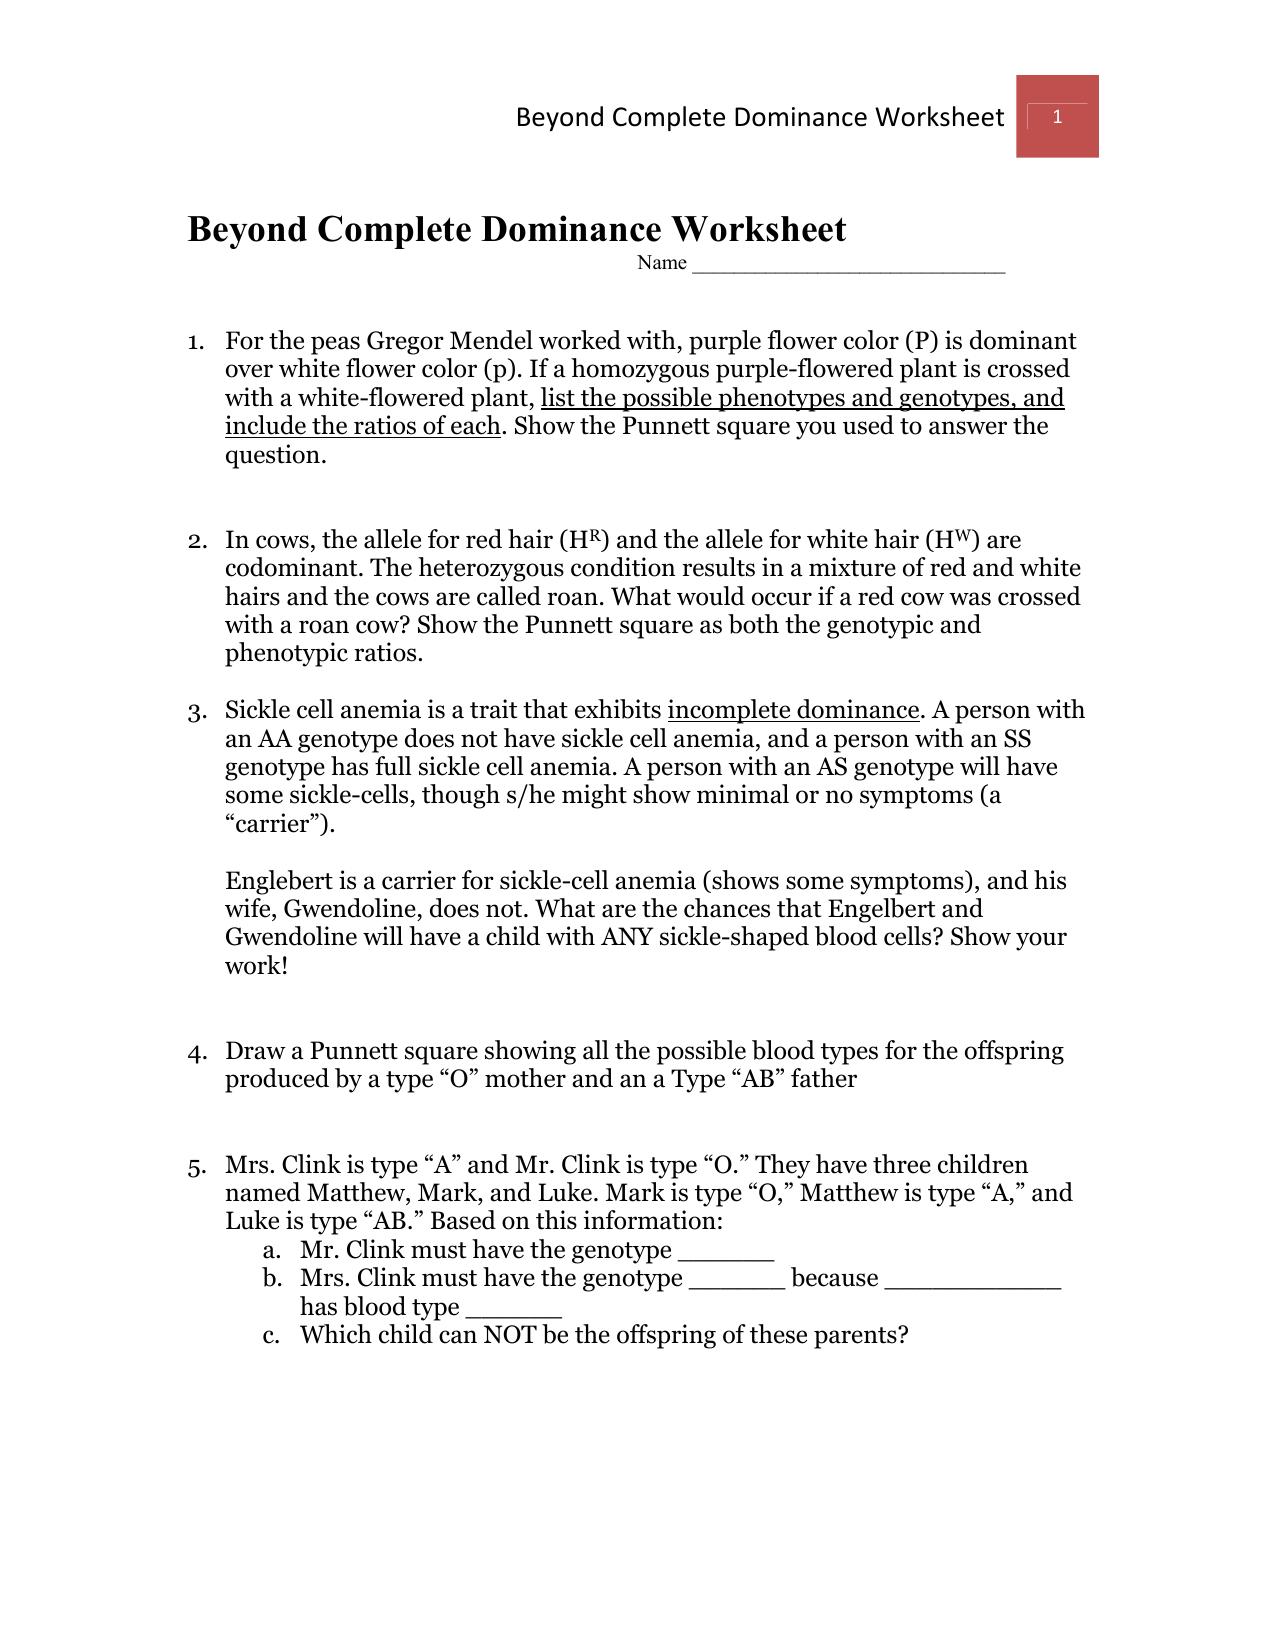 Beyond Complete Dominance Worksheet